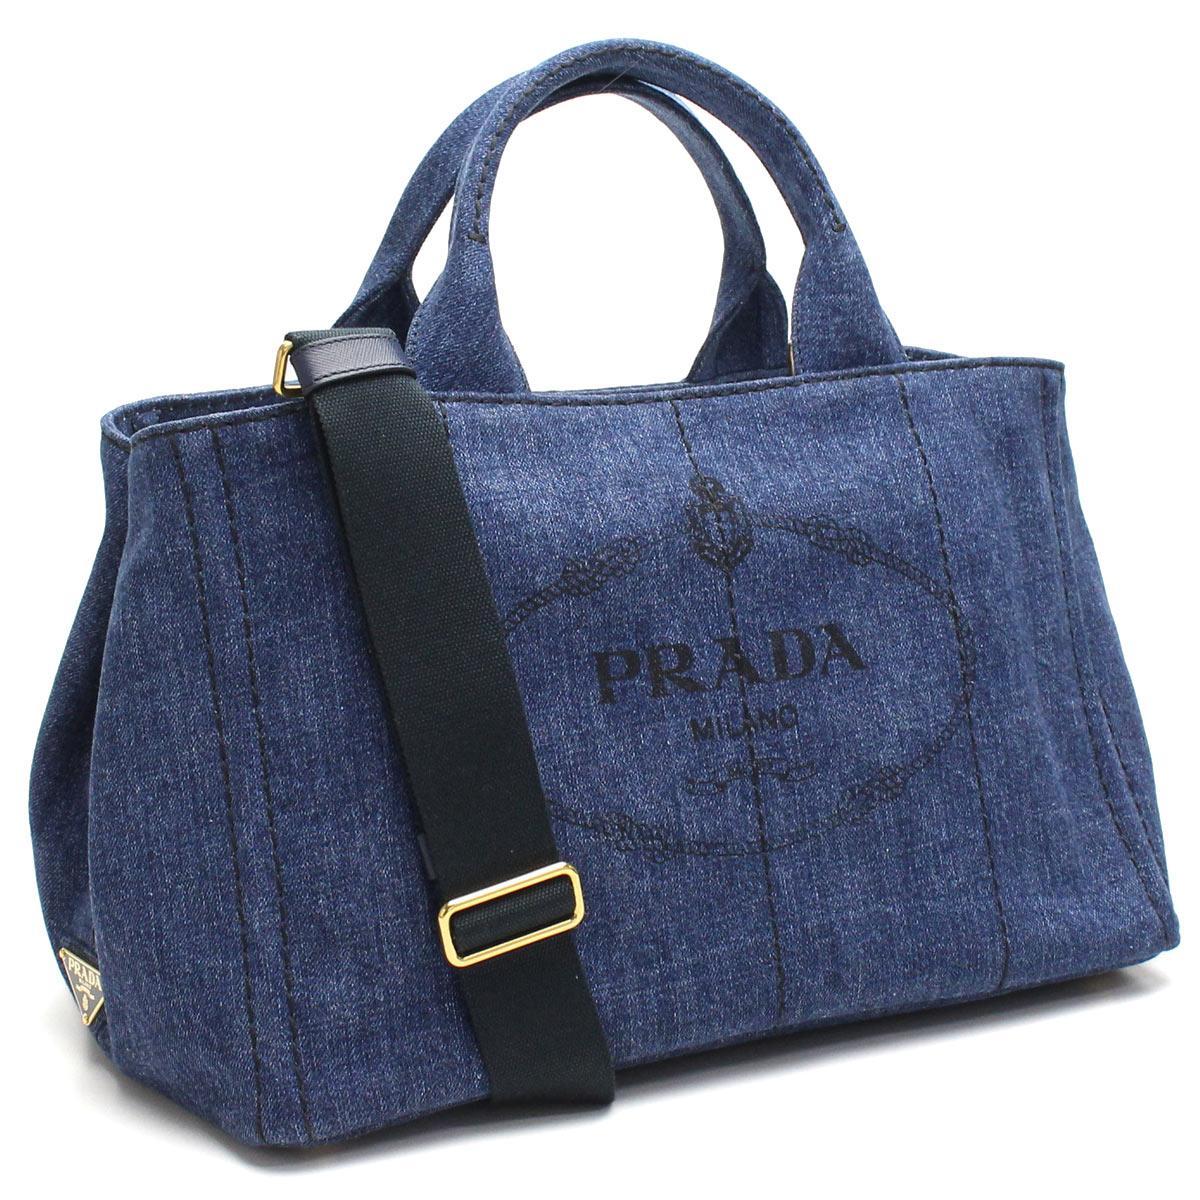 Bighit The total brand wholesale  Prada (PRADA) tote bag 1 BG642 AJ6 F0008  BLEU blue  108d44caff4a5